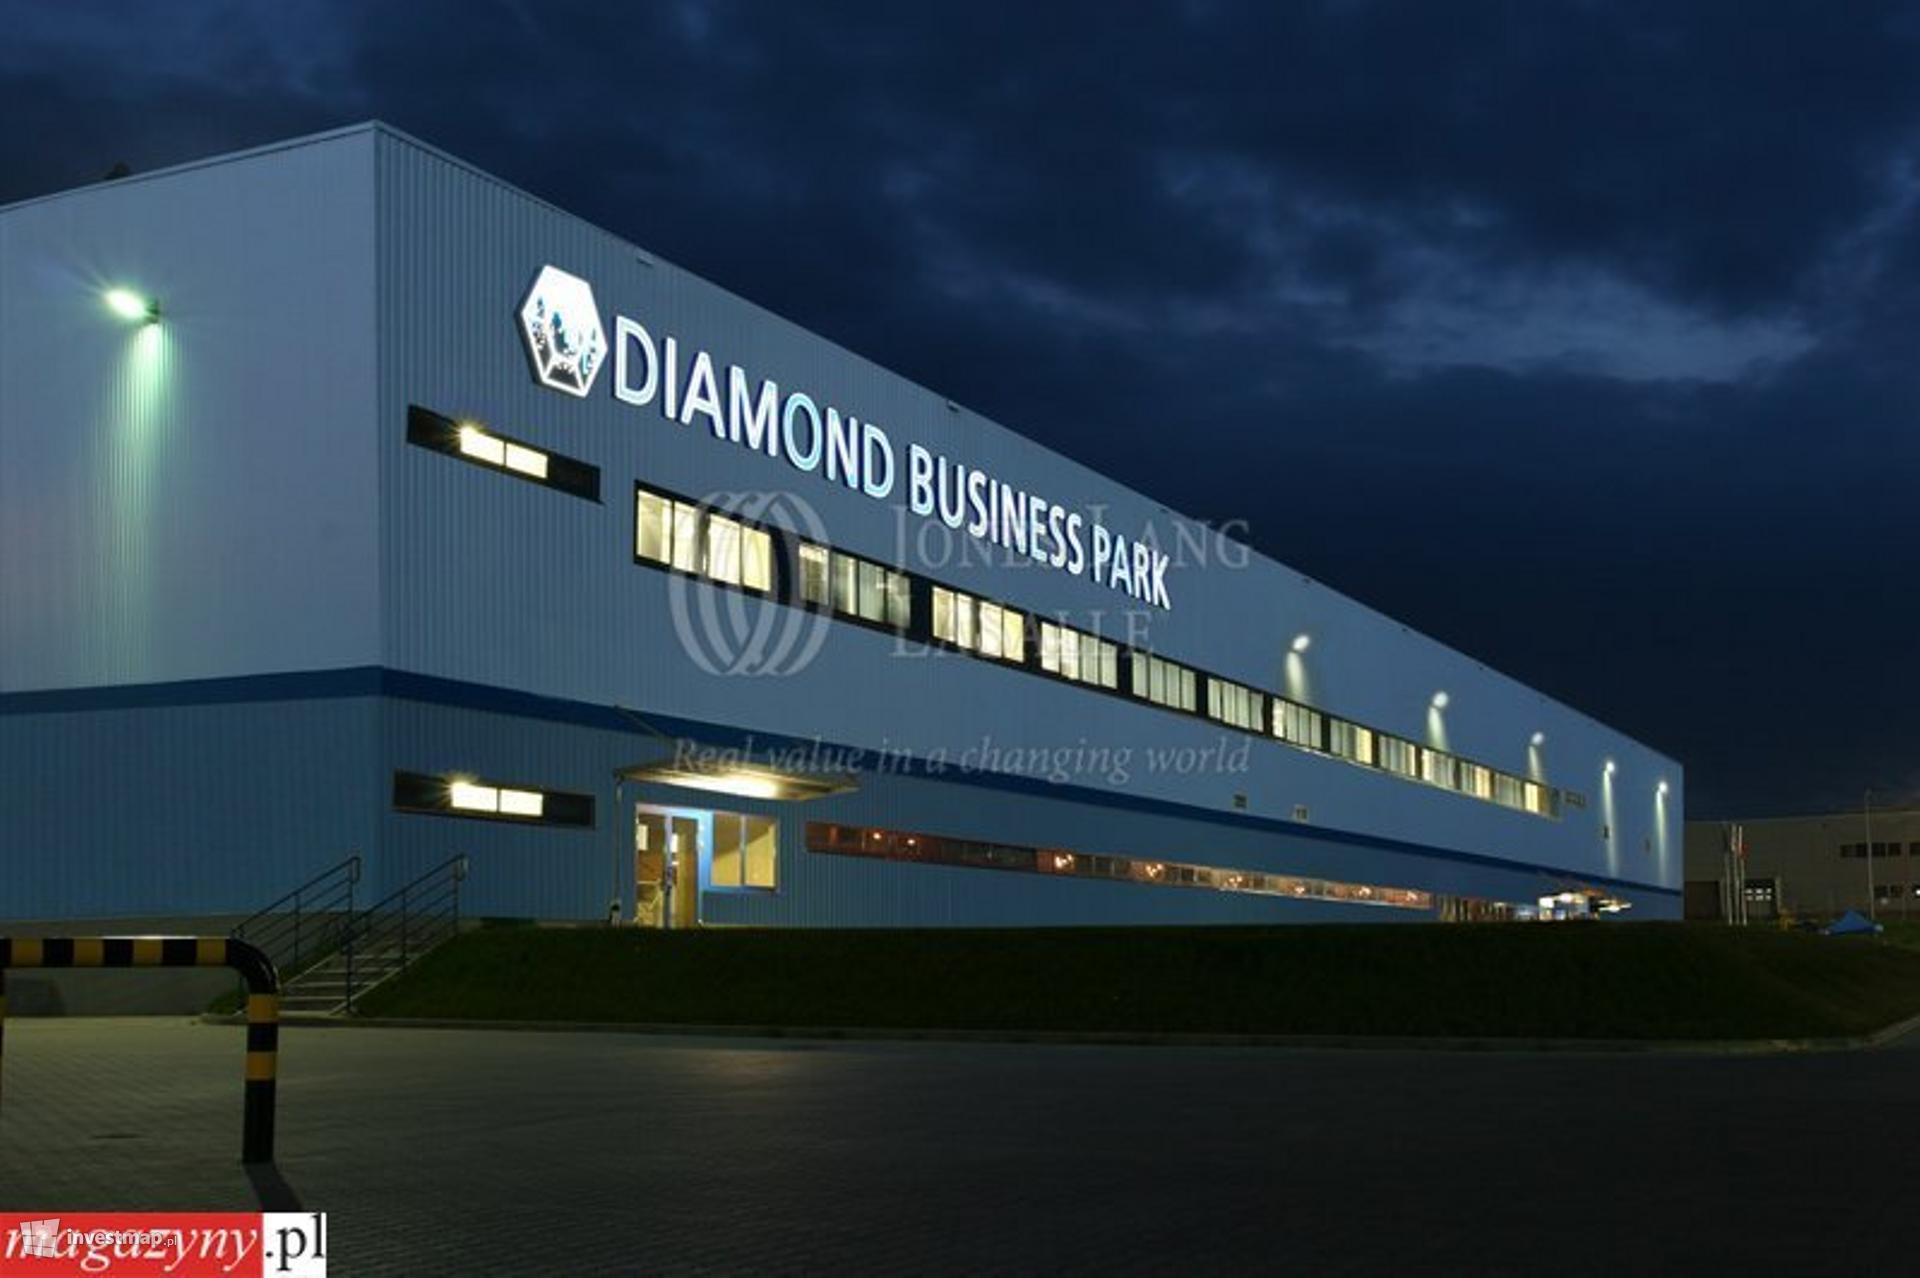 Diamond Business Park Gliwice